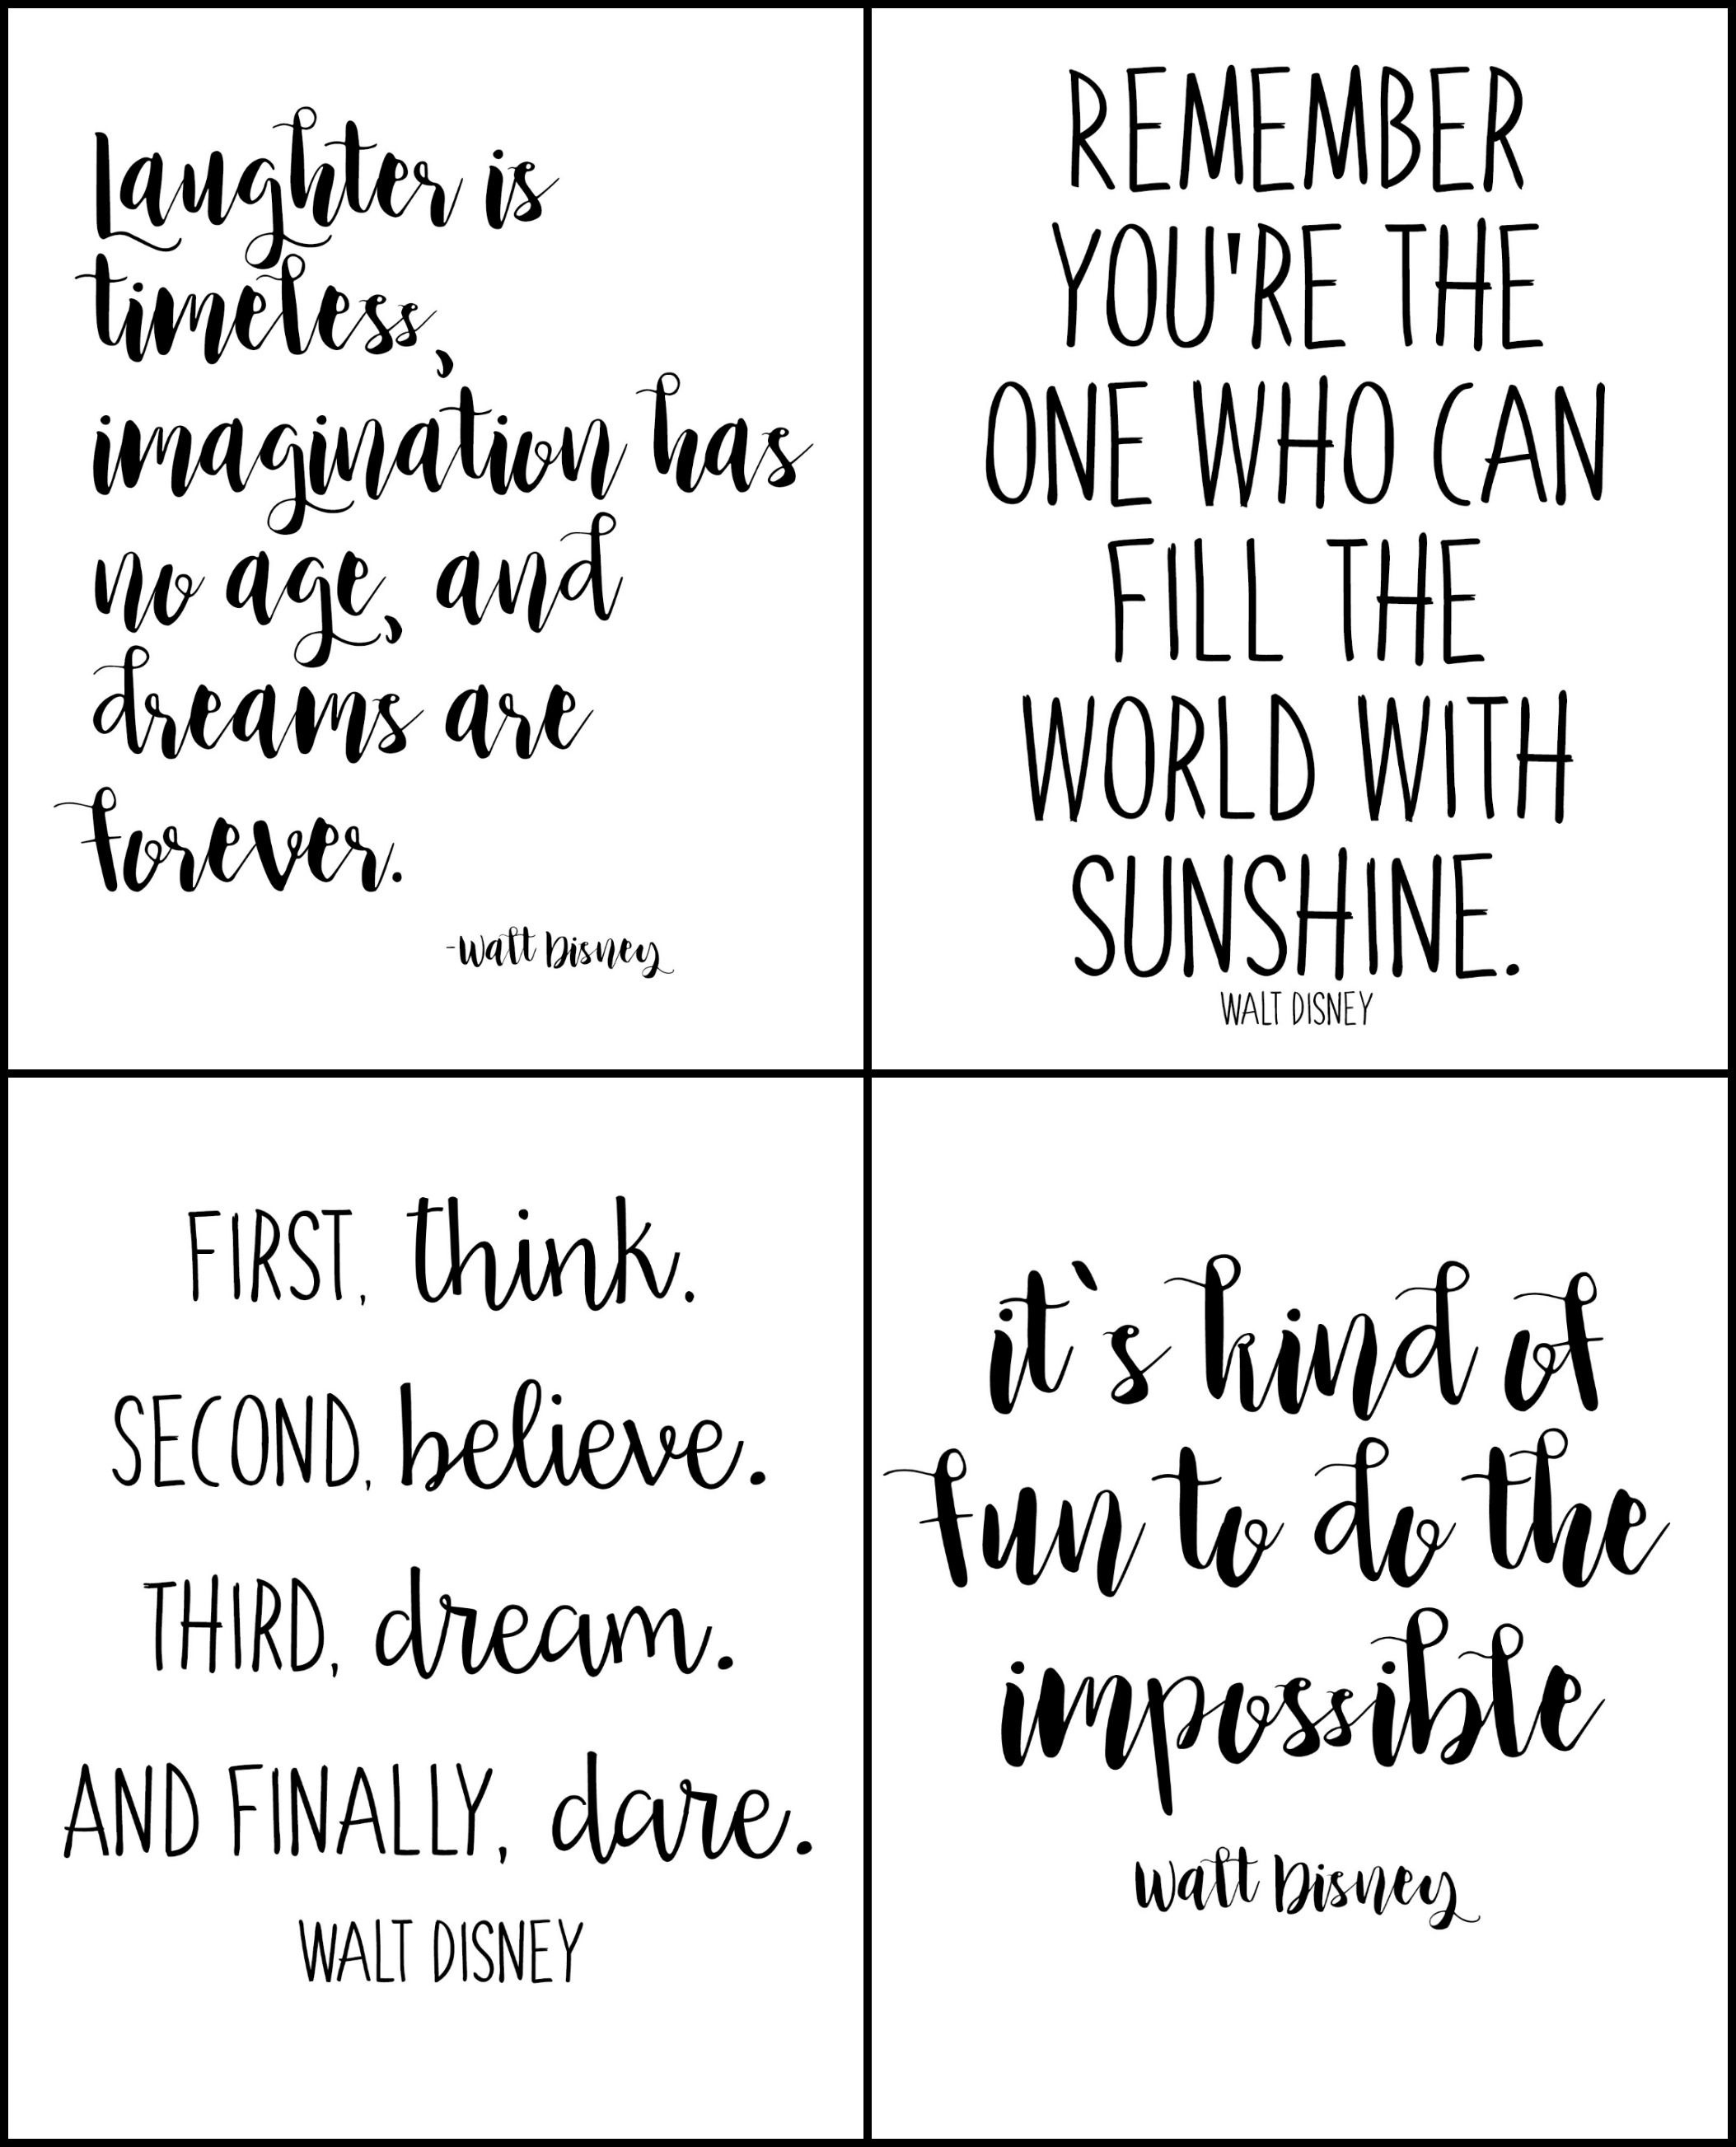 Free Printable Walt Disney Quotes   Disney   Walt Disney Quotes - Free Printable Quotes